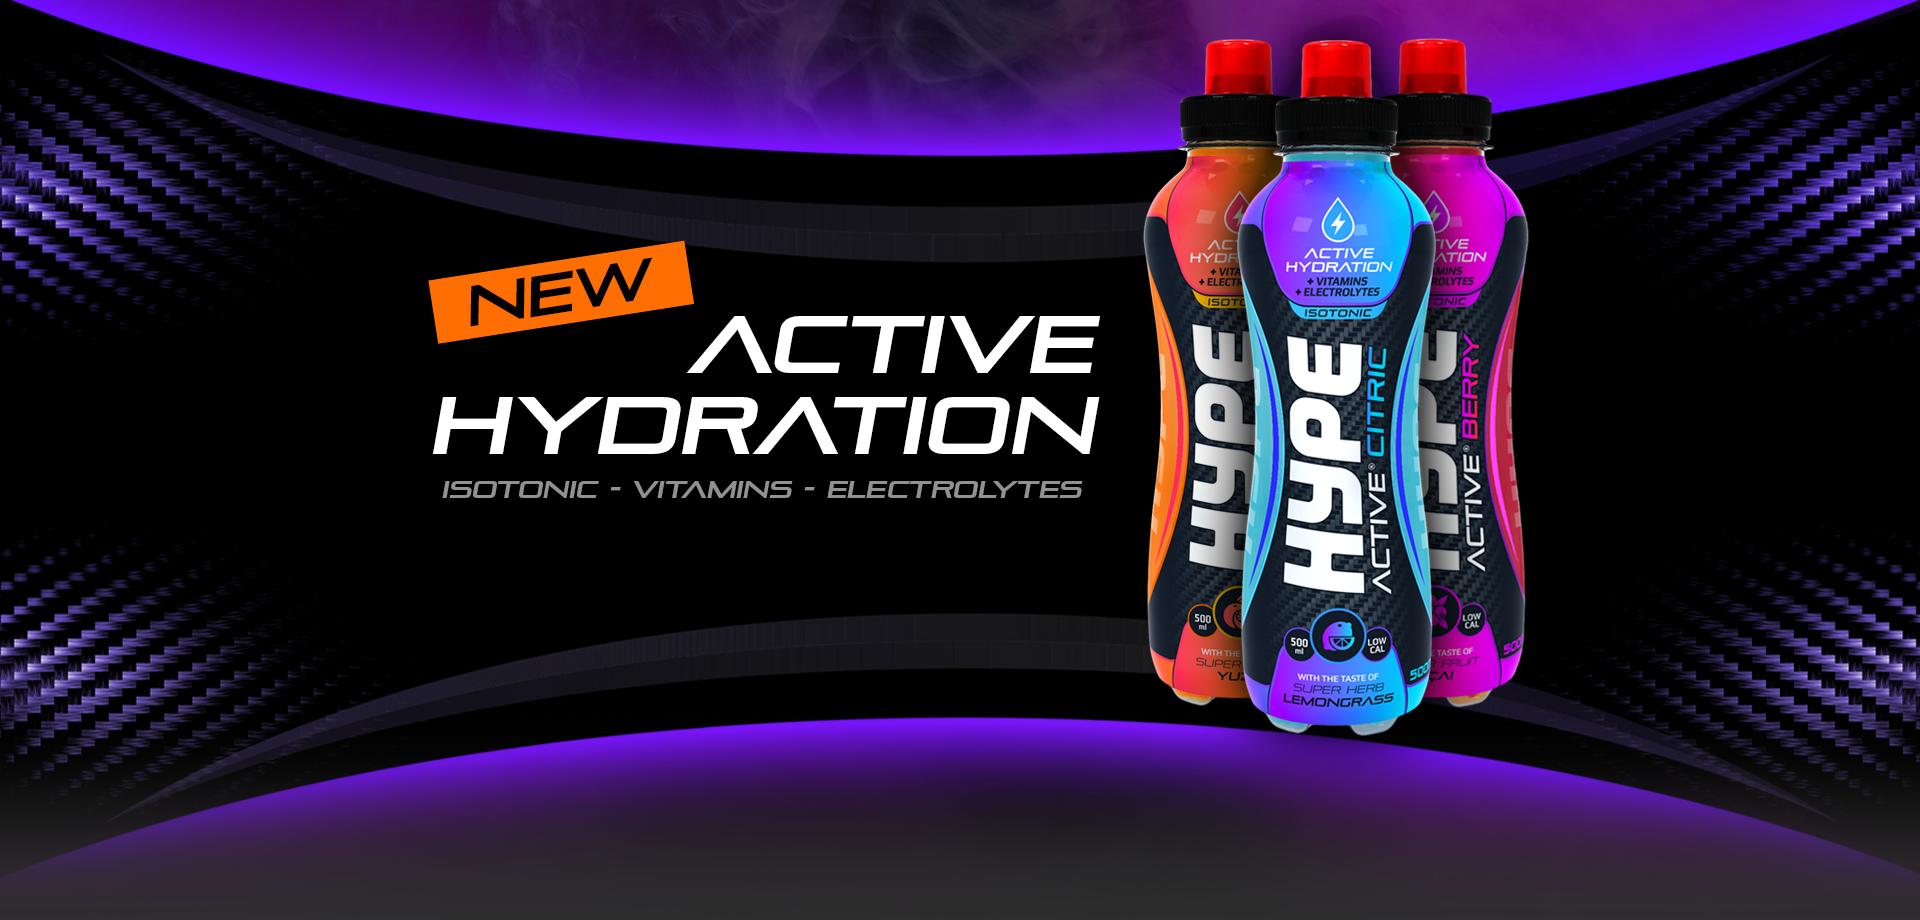 New Product Range: Hype Active